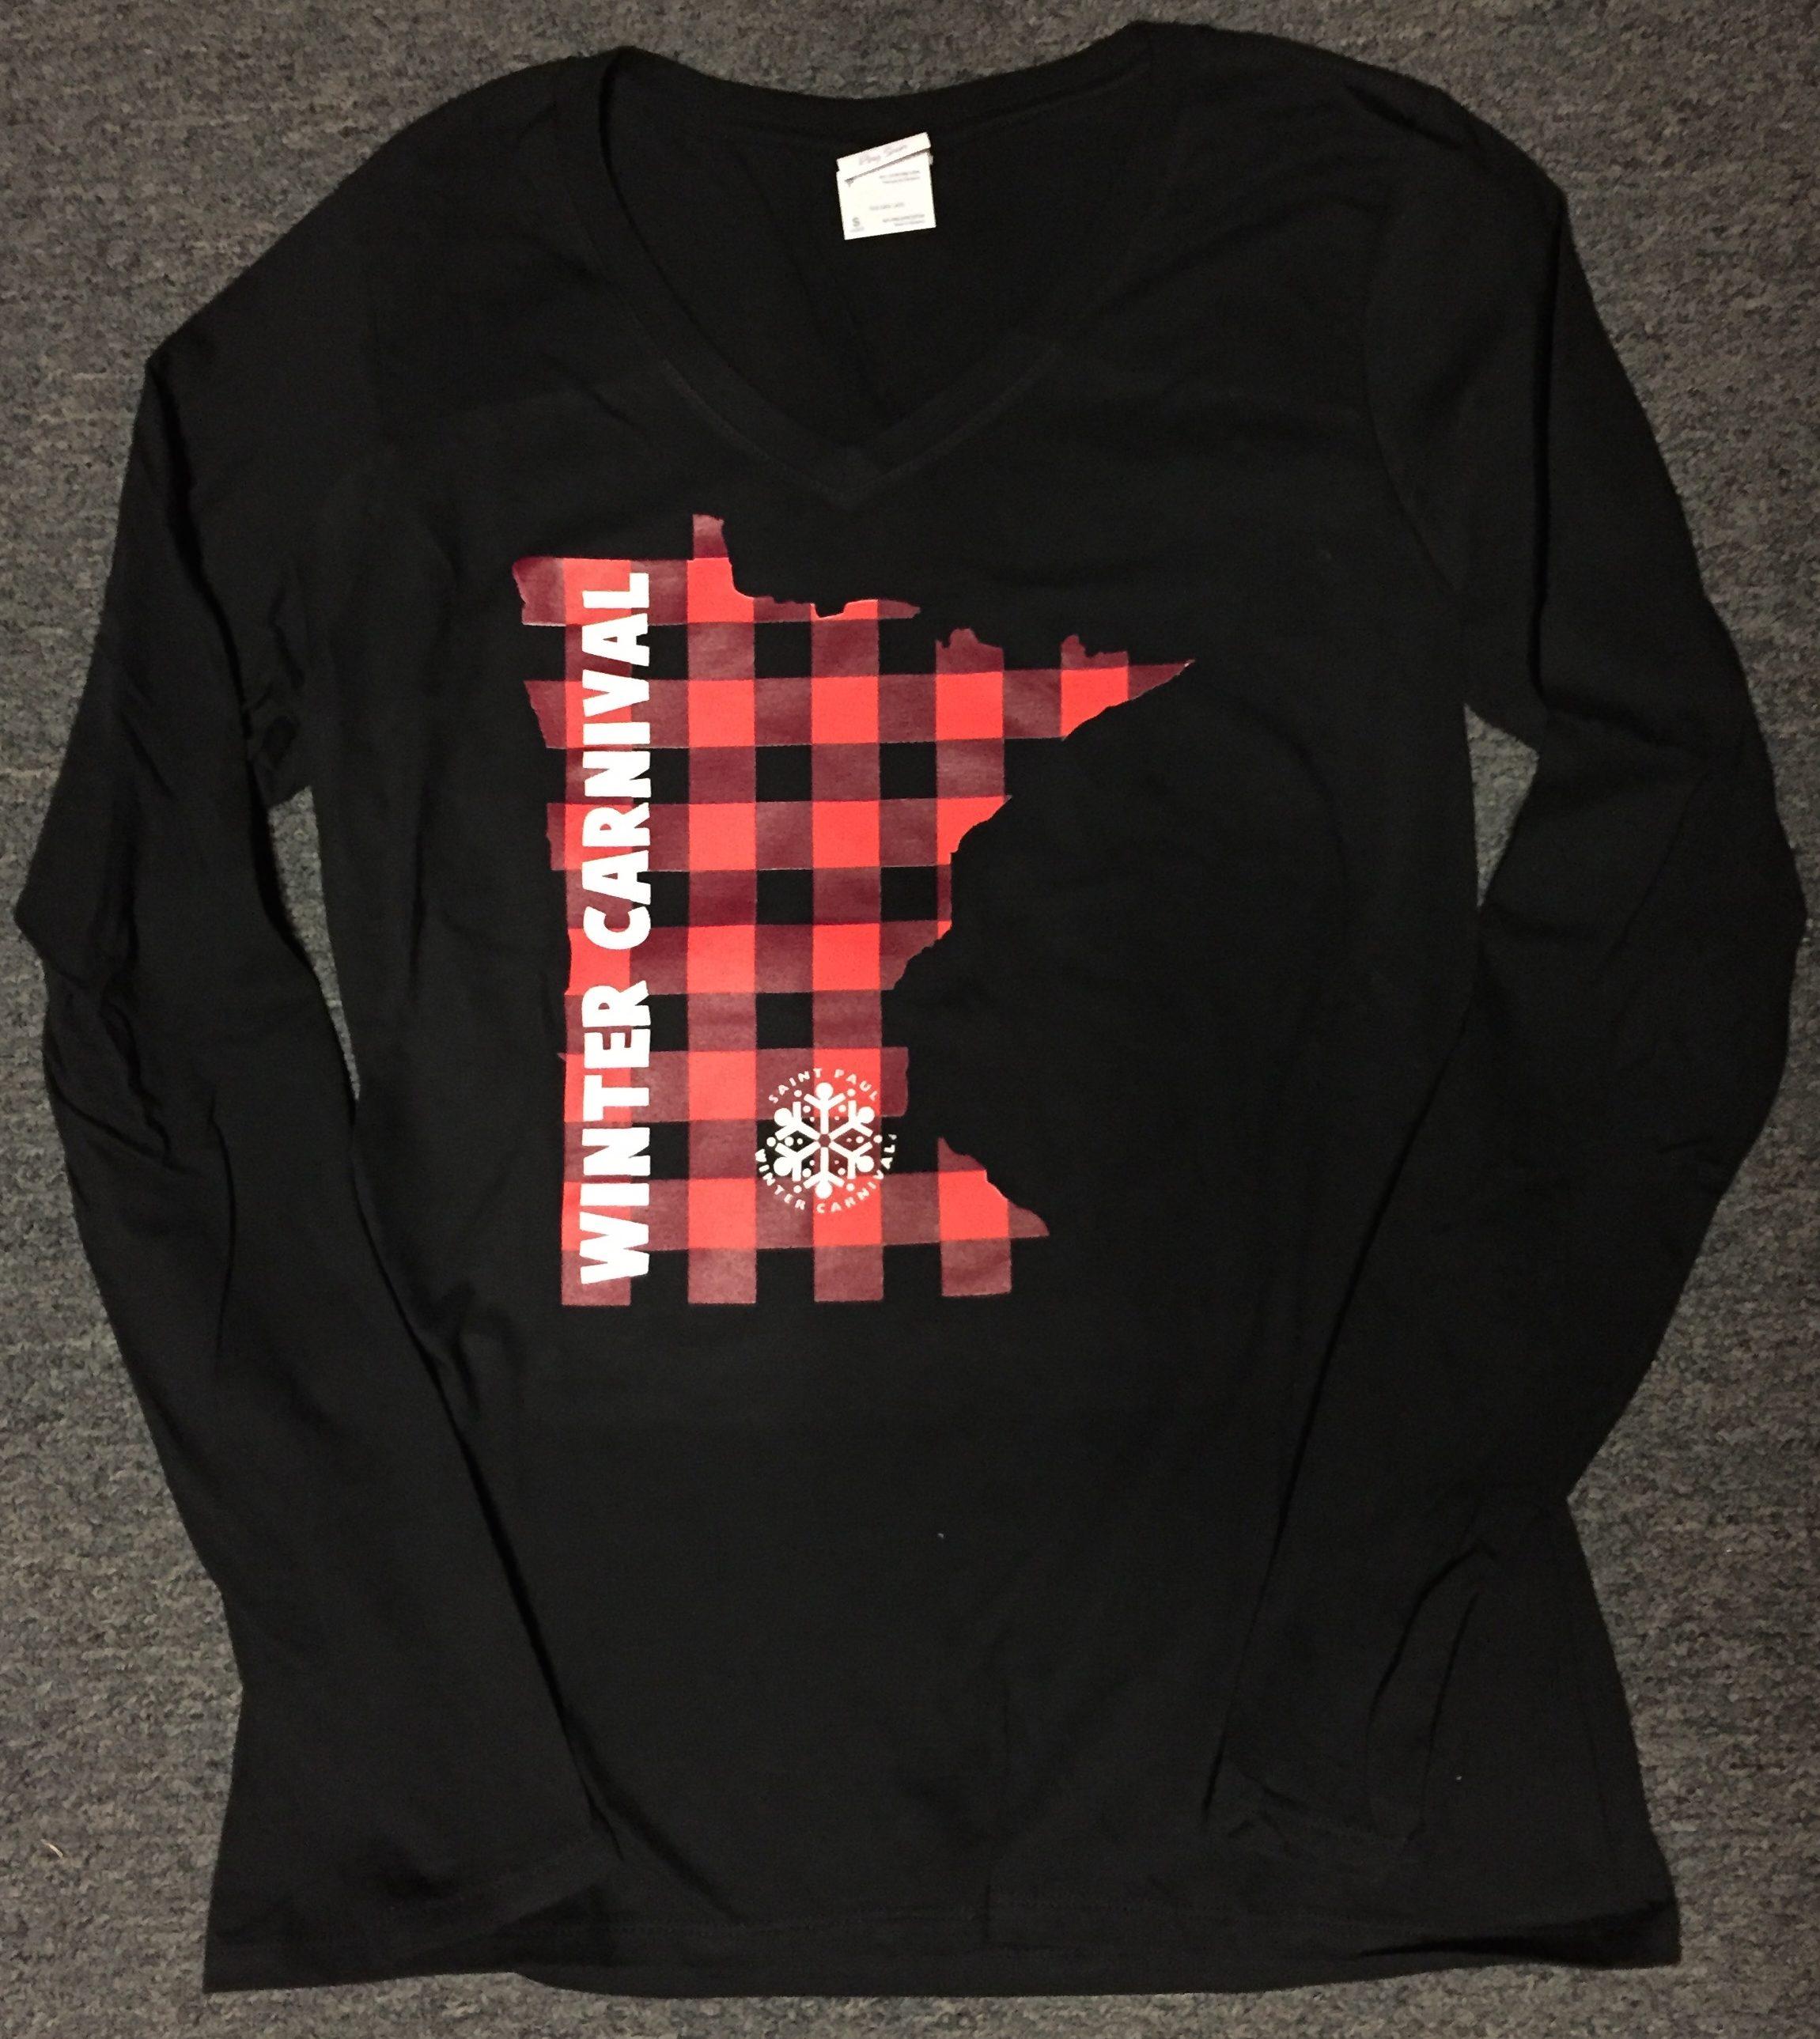 Black Red Checkered Mn State Shirt Saint Paul Winter